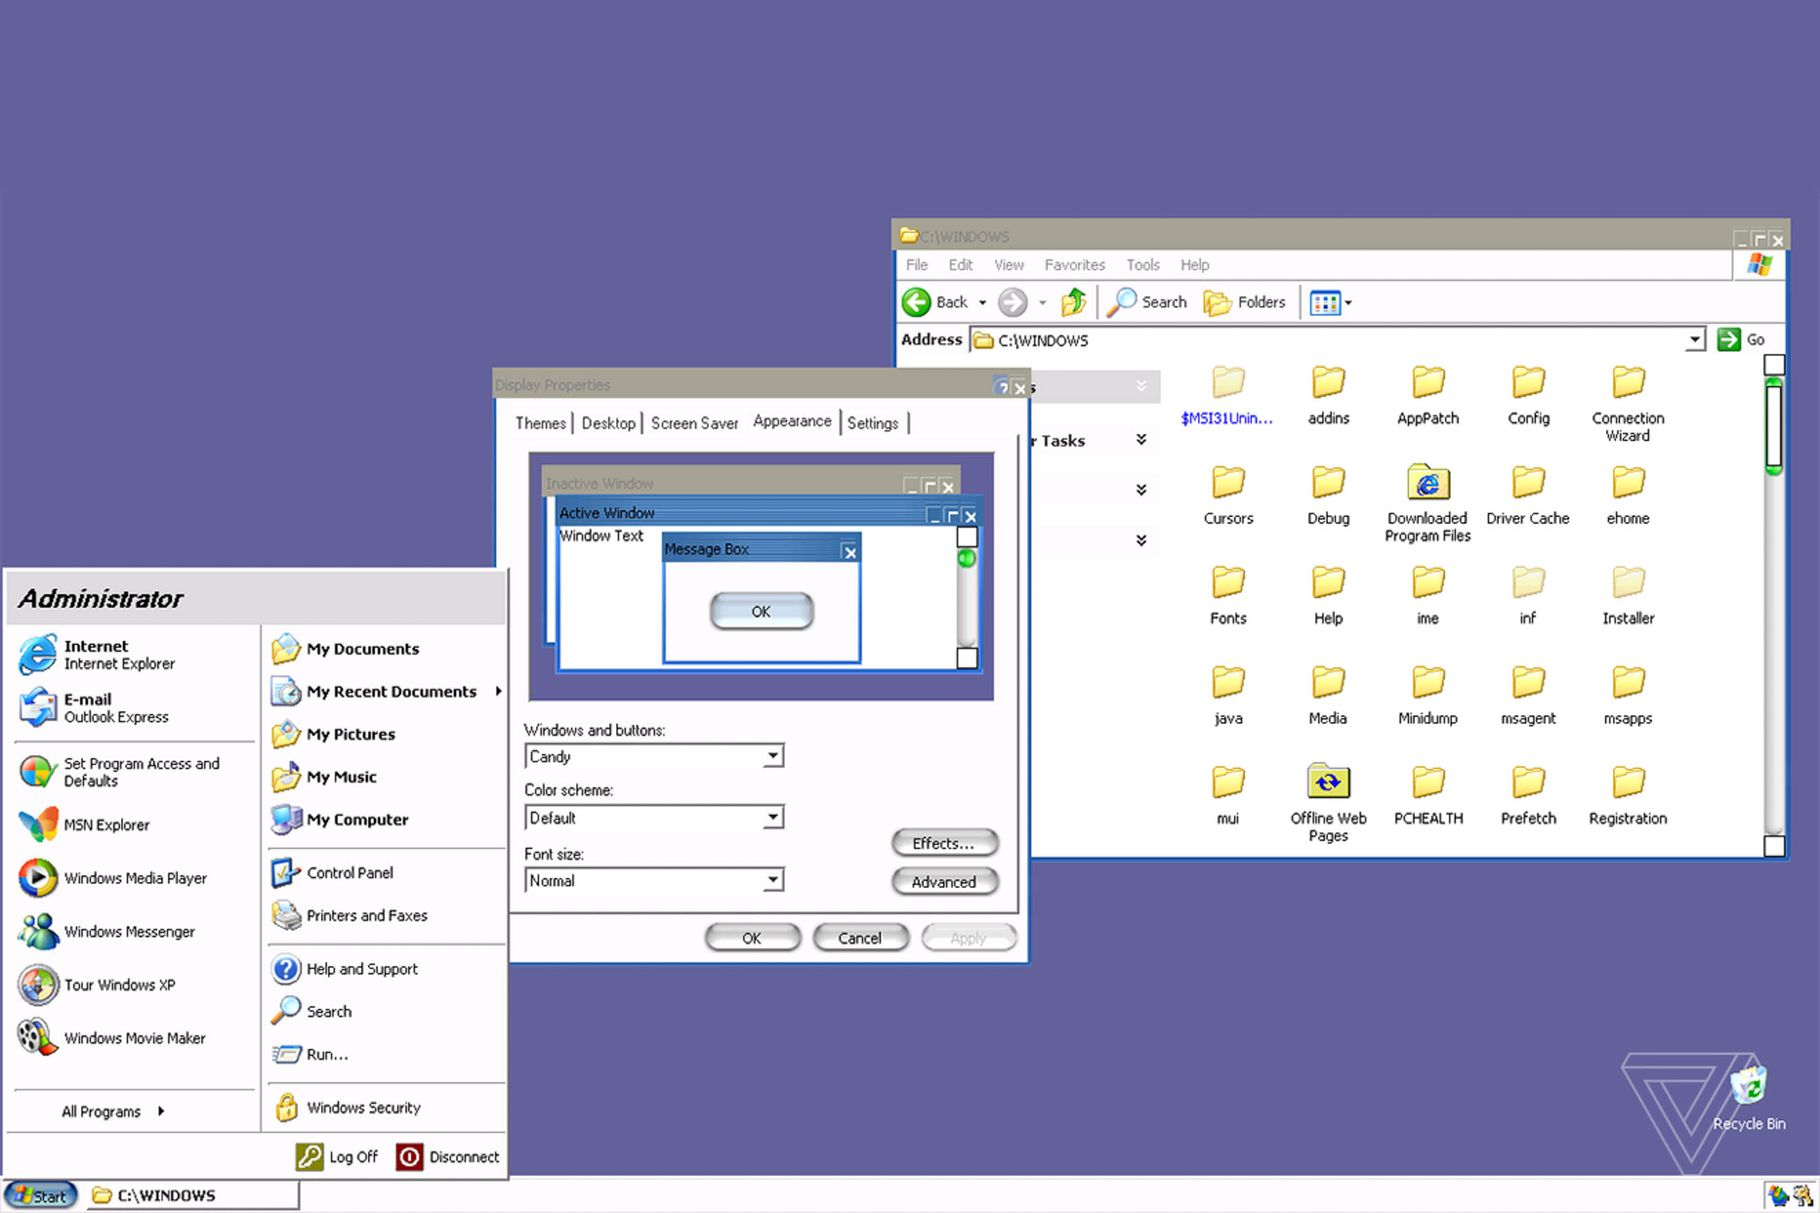 https://cdn.vox-cdn.com/thumbor/tk8zcd3QJgyUxKjbPWmR5ReG5r4=/0x0:2640x1760/1820x1213/filters:focal(1109x669:1531x1091)/cdn.vox-cdn.com/uploads/chorus_image/image/67471847/twarren_windowsxpsqualeak.0.jpg